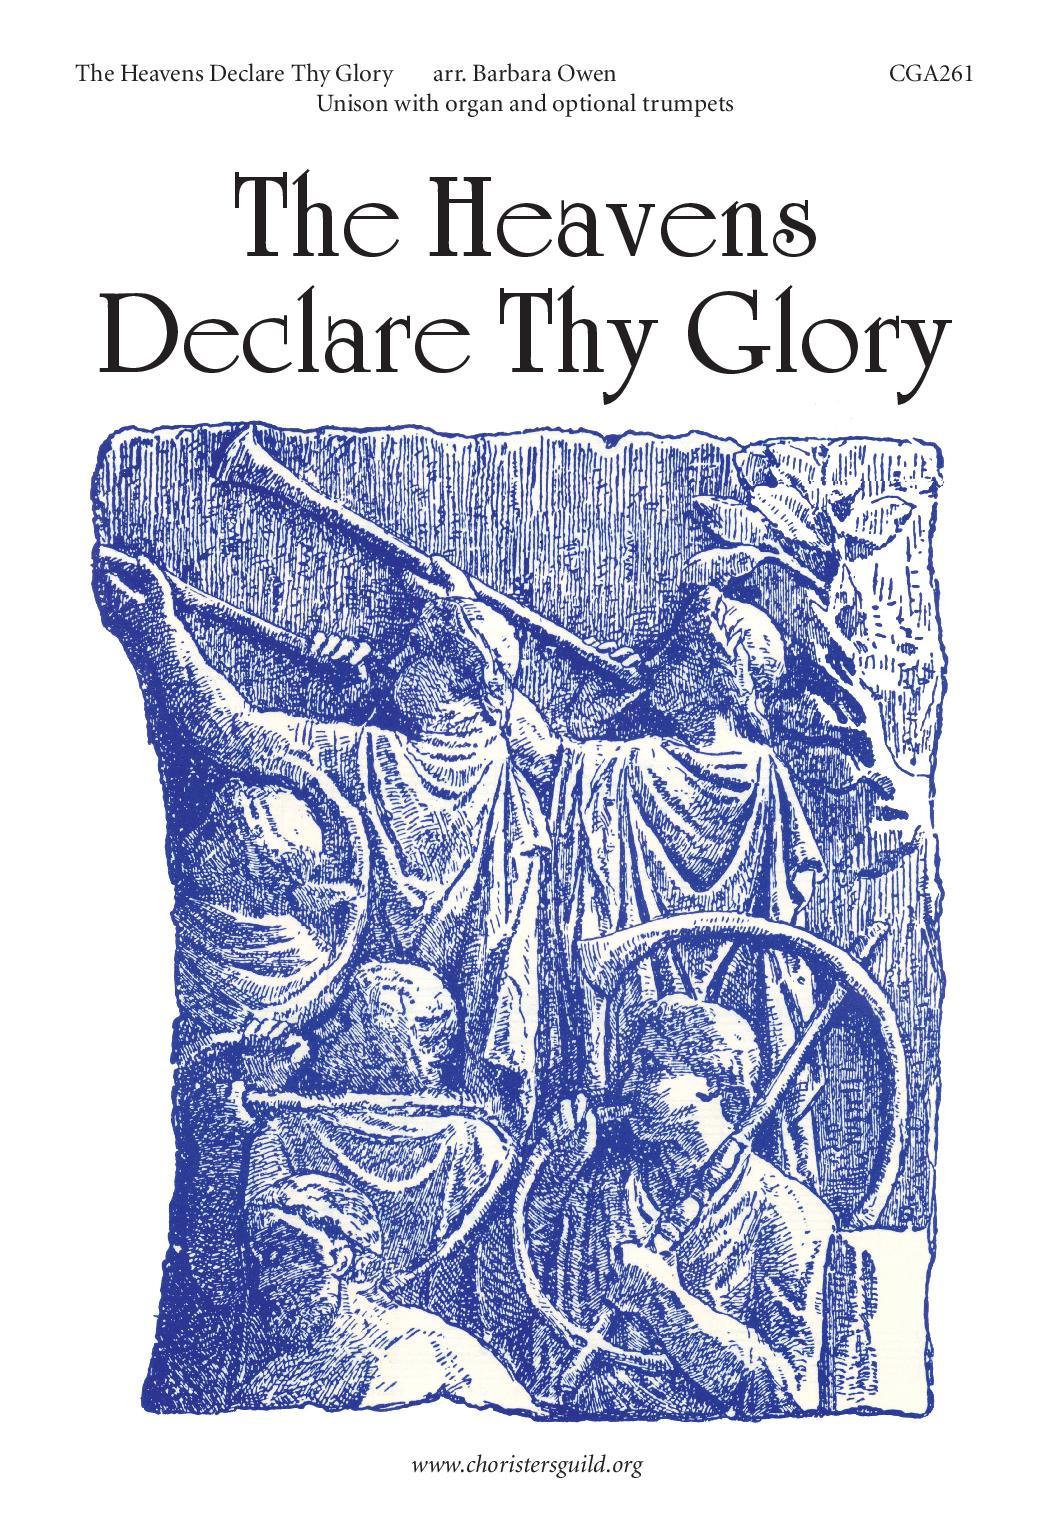 The Heavens Declare Thy Glory